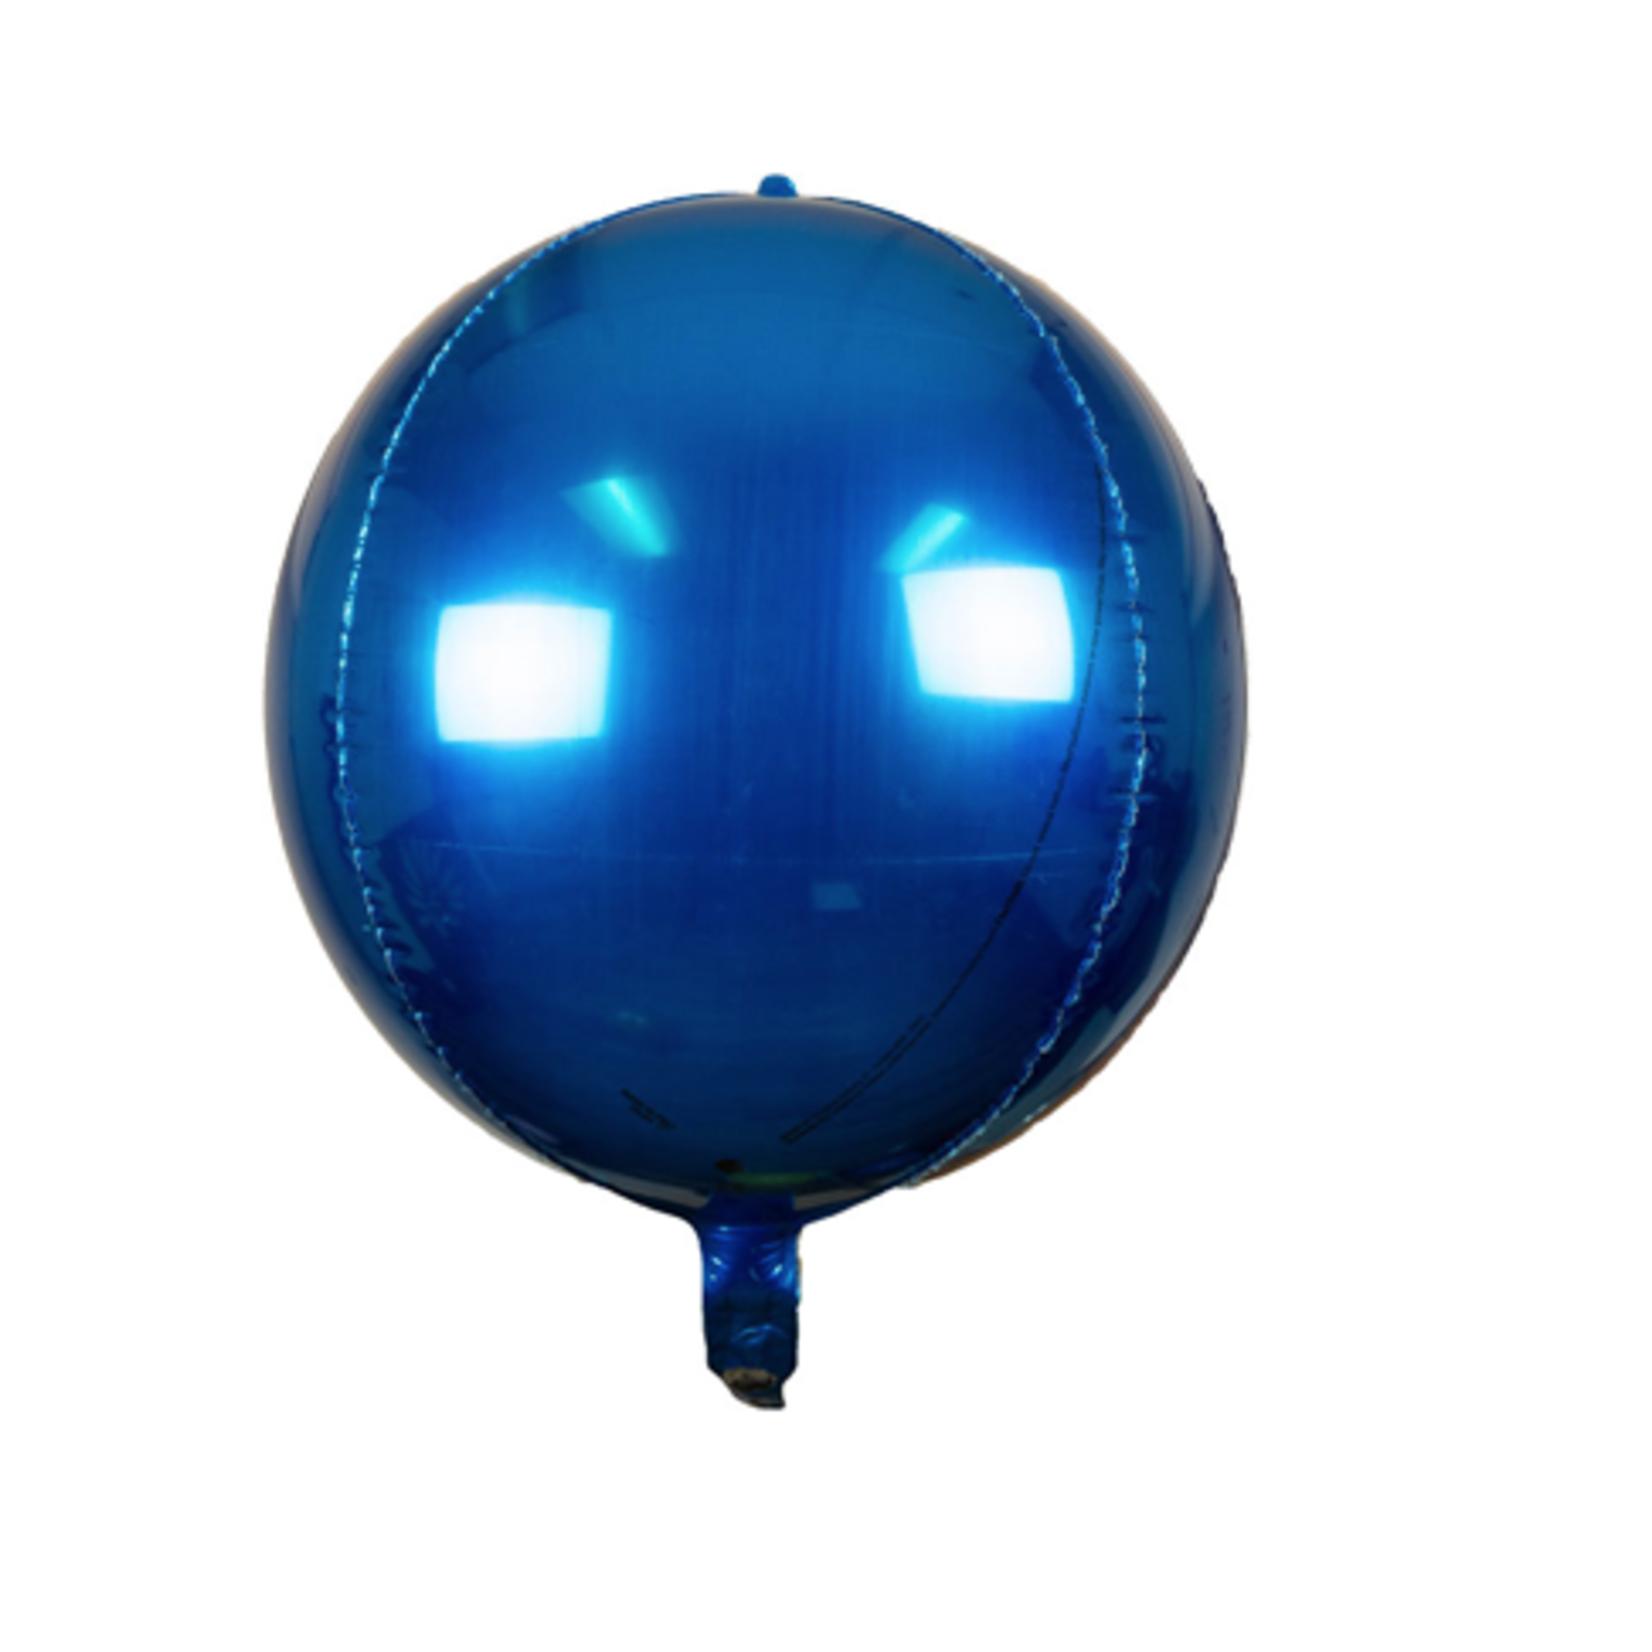 "24'' SPHERE ""ORB"" FOIL BALLOON ROYAL BLUE"